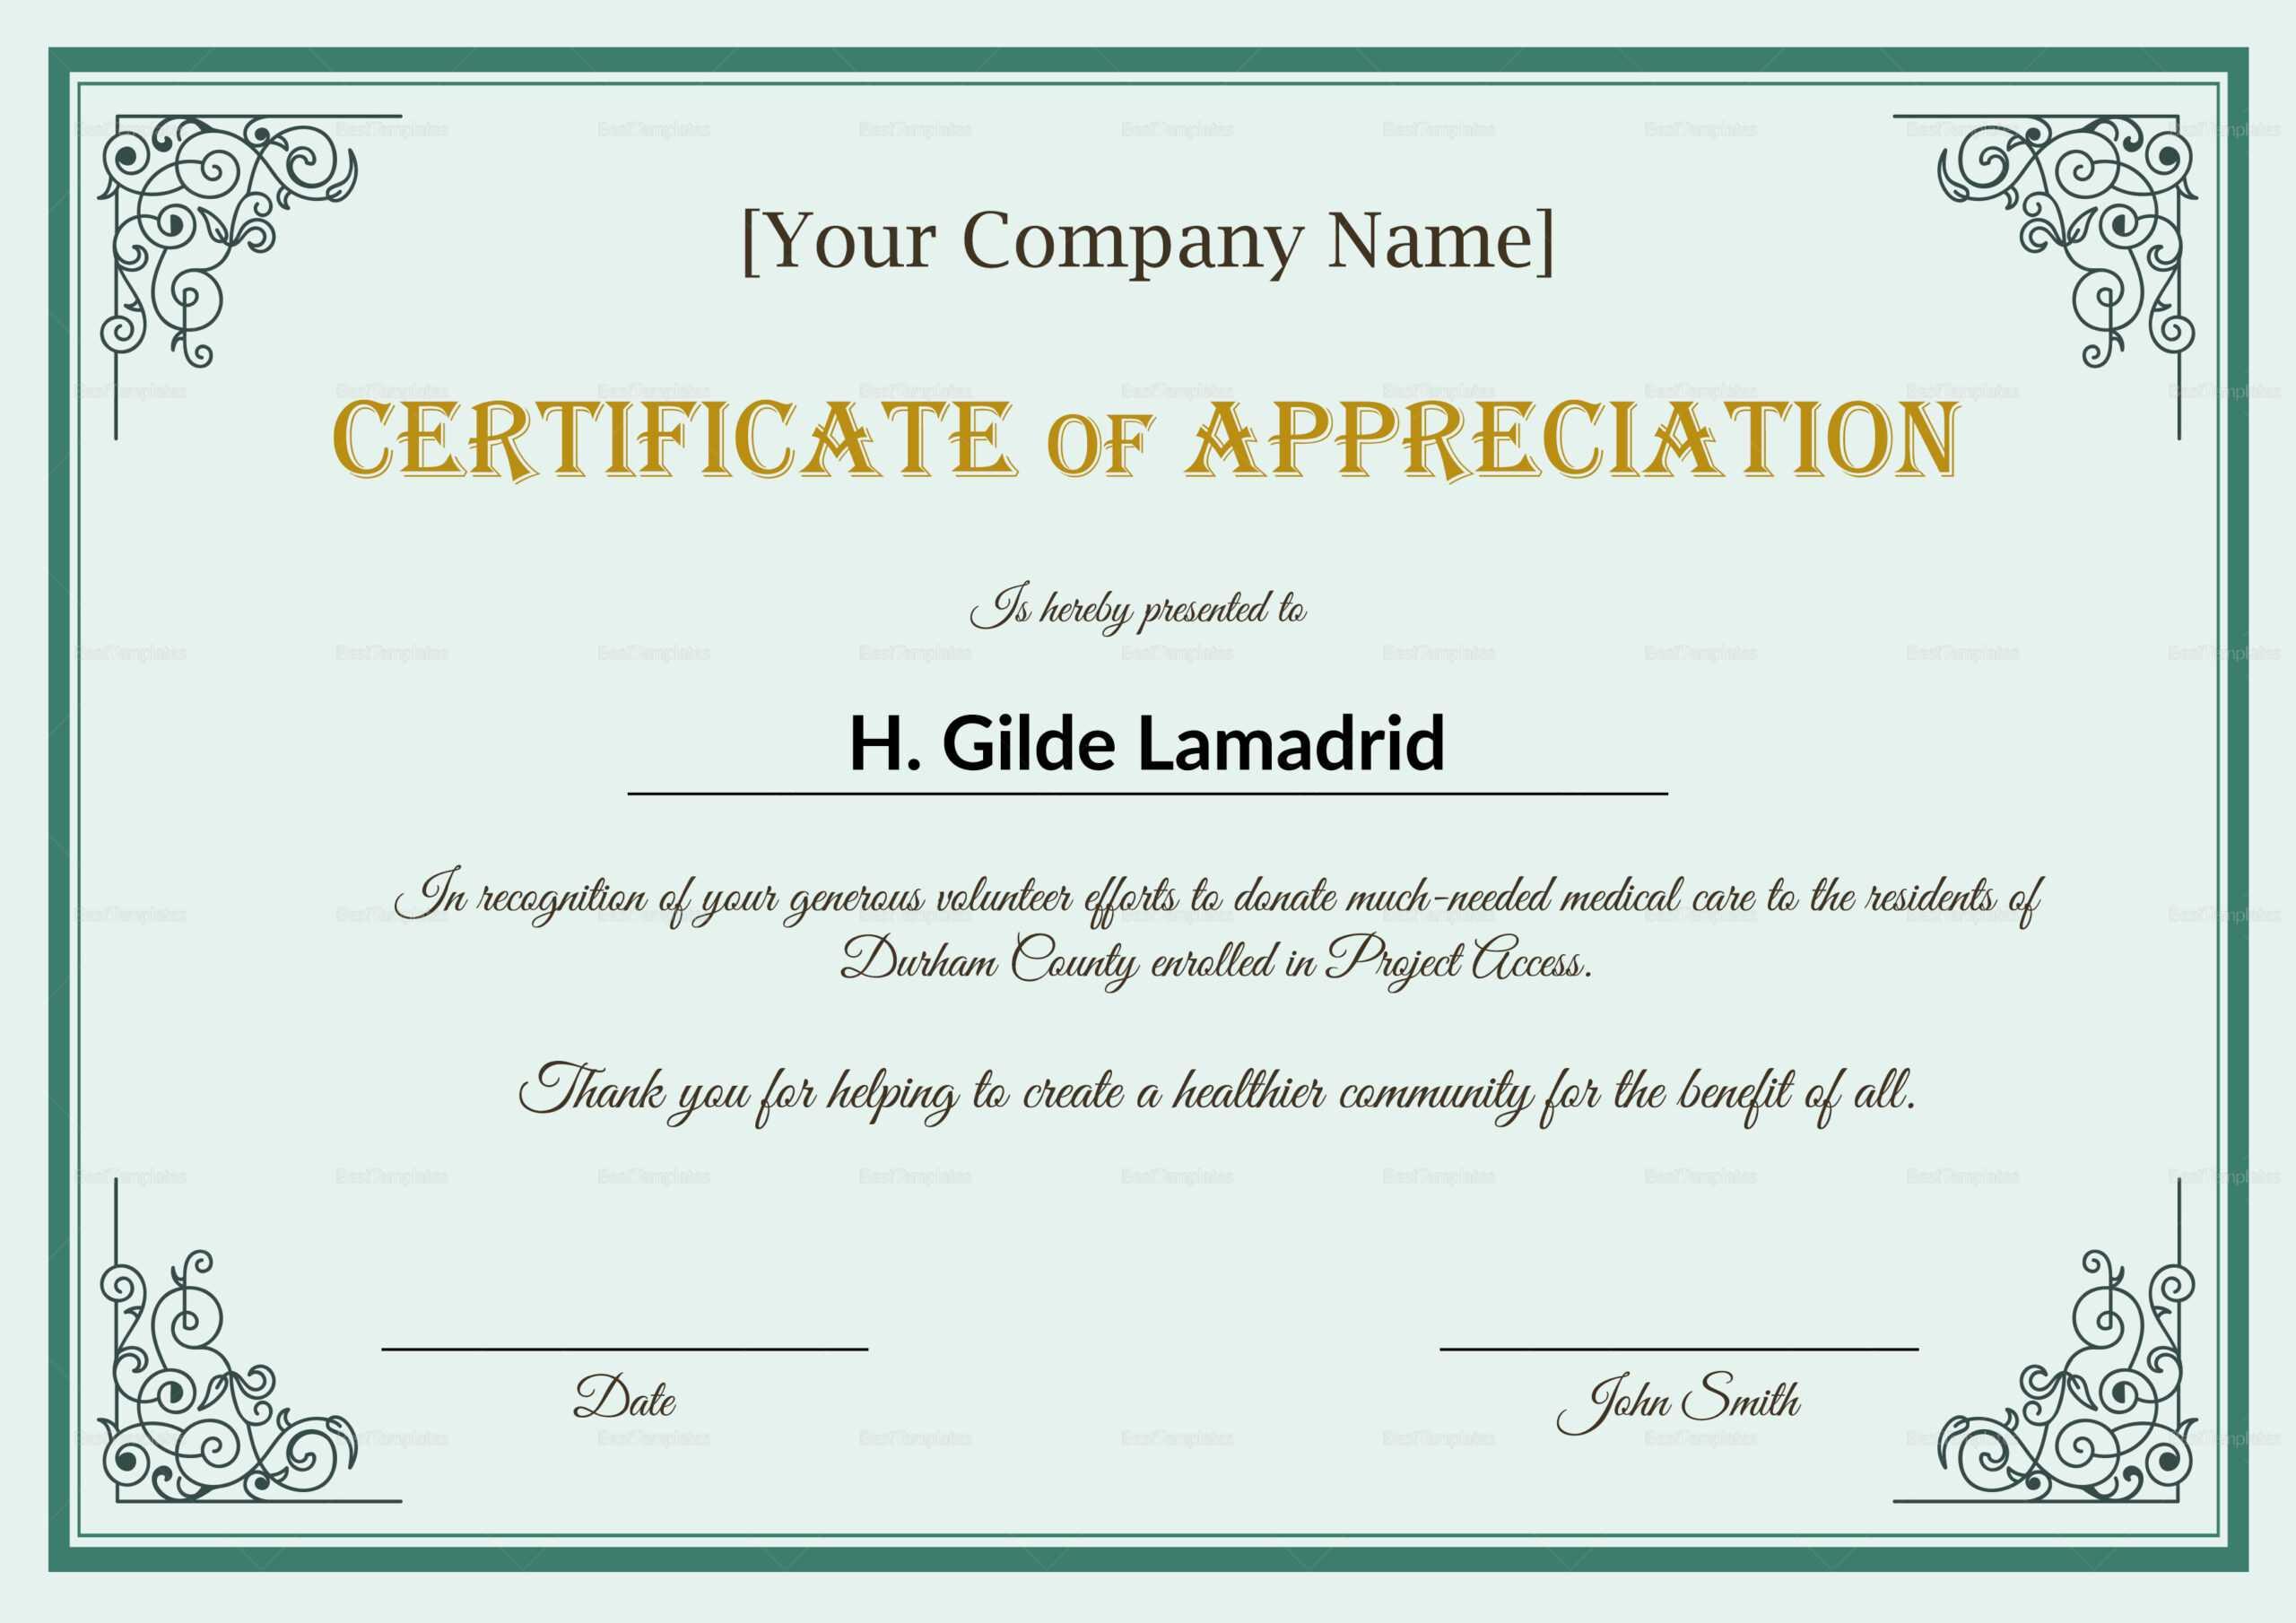 Company Employee Appreciation Certificate Template With Regard To In Appreciation Certificate Templates